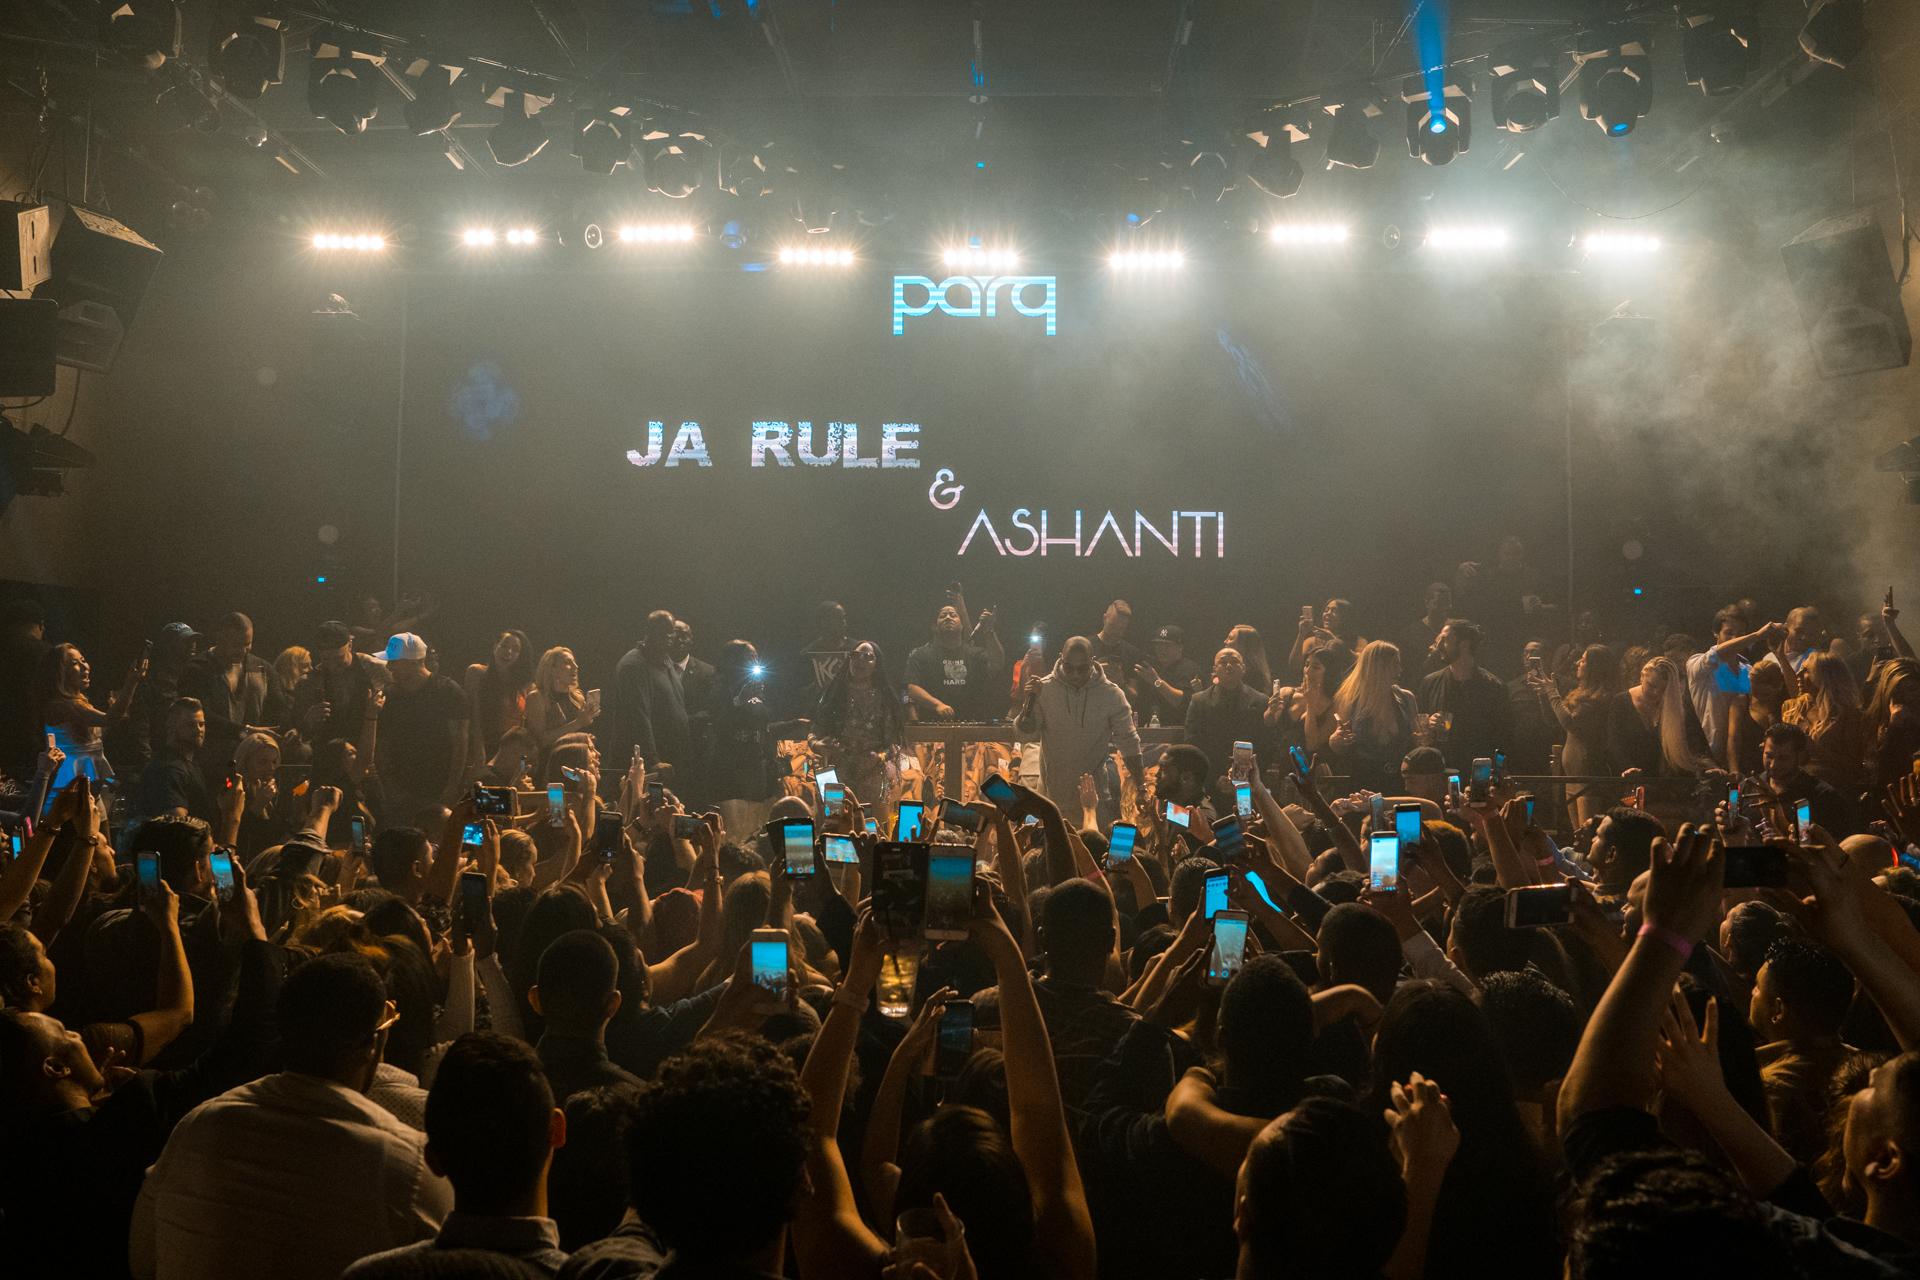 02.09.18 Parq - JaRule-Ashanti--1.jpg